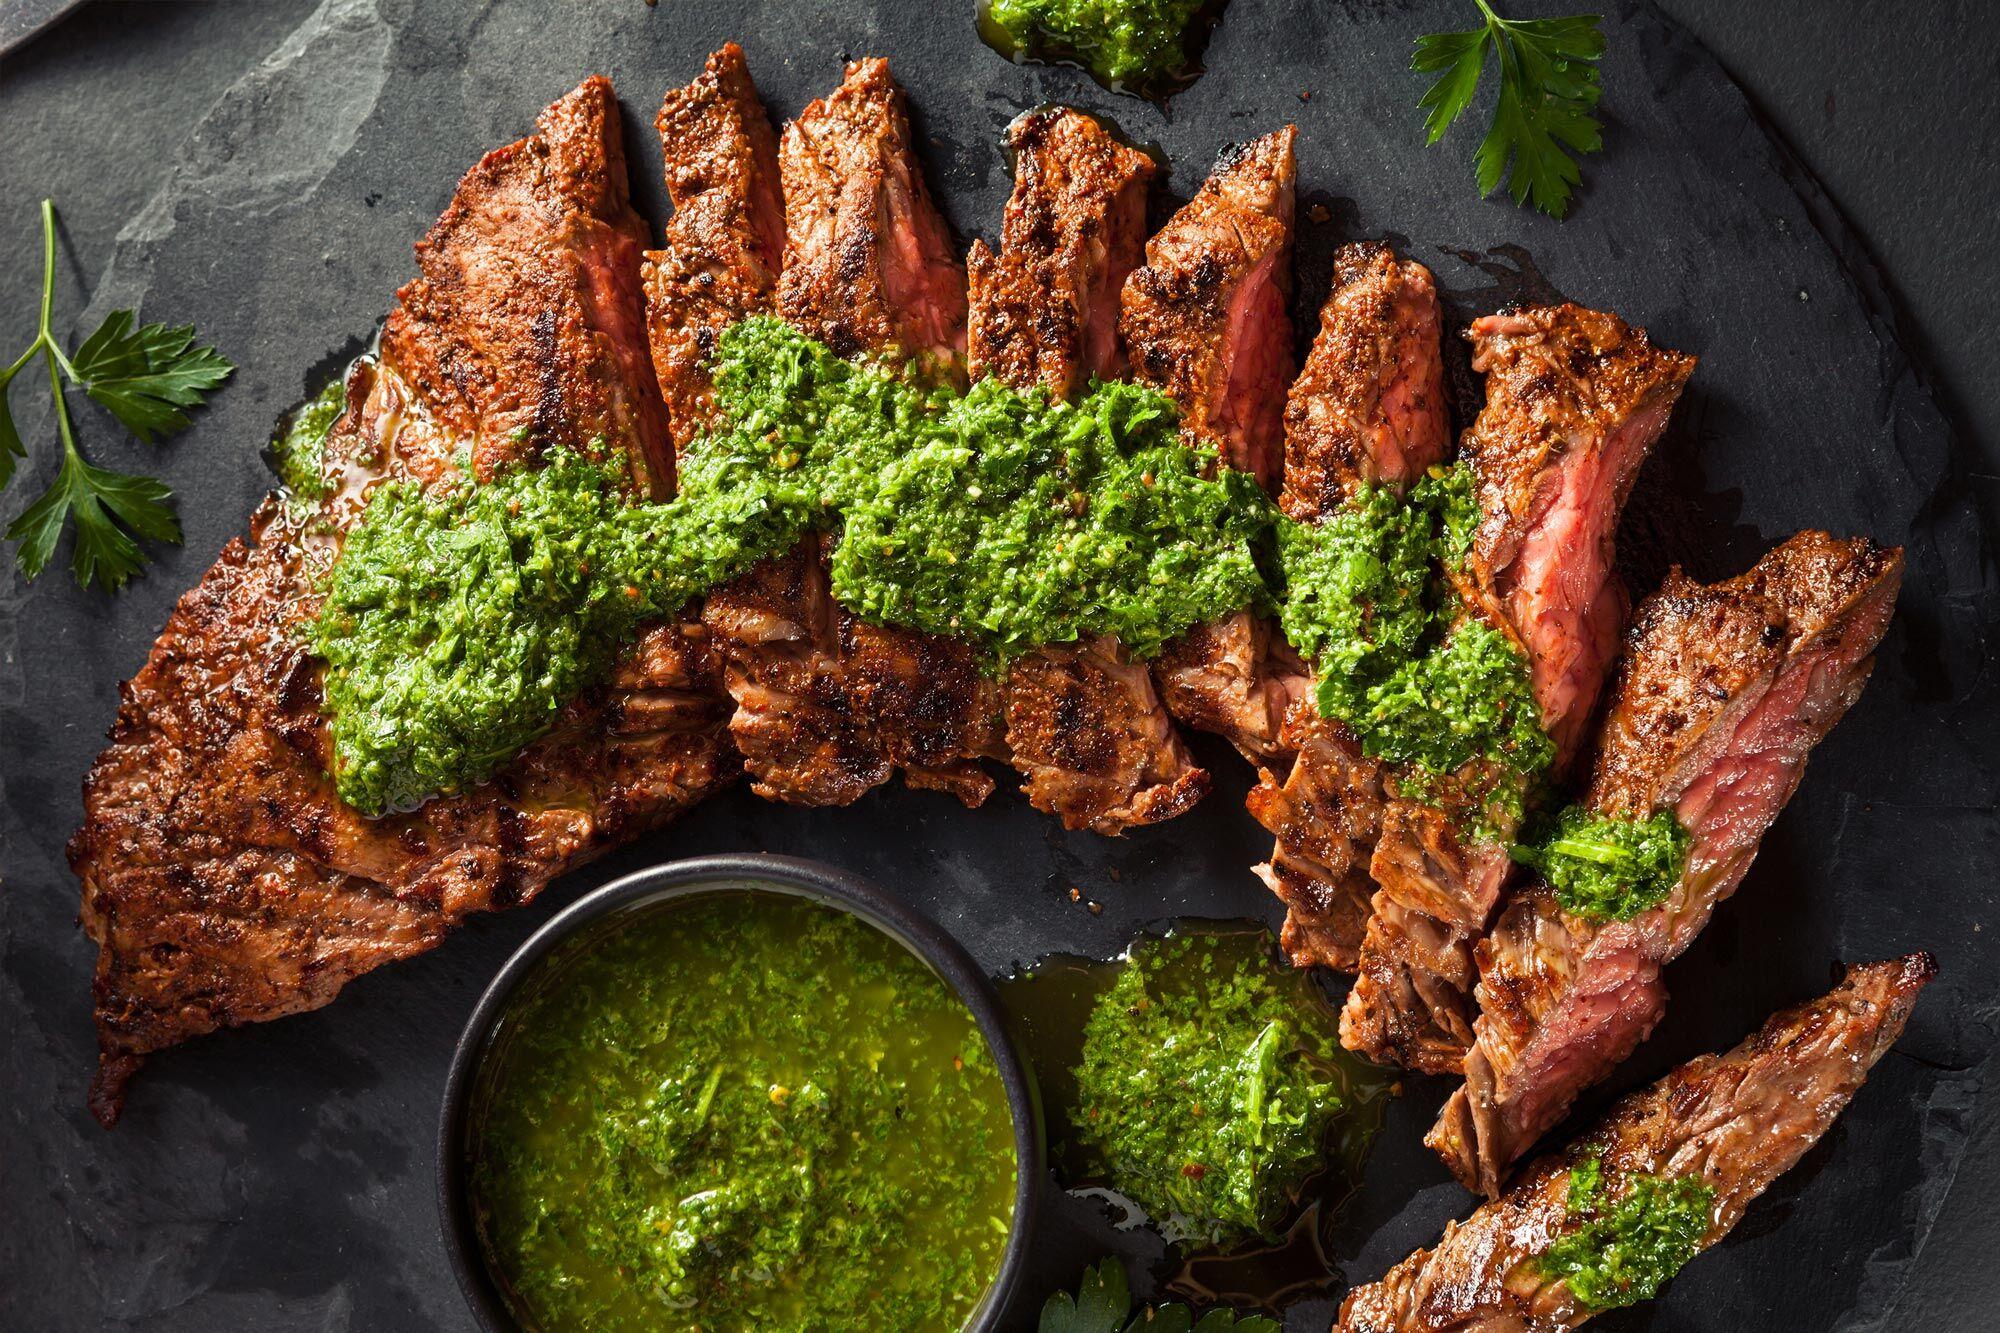 Marios Italian Deli | Picture of Chimichurri Skirt Steak